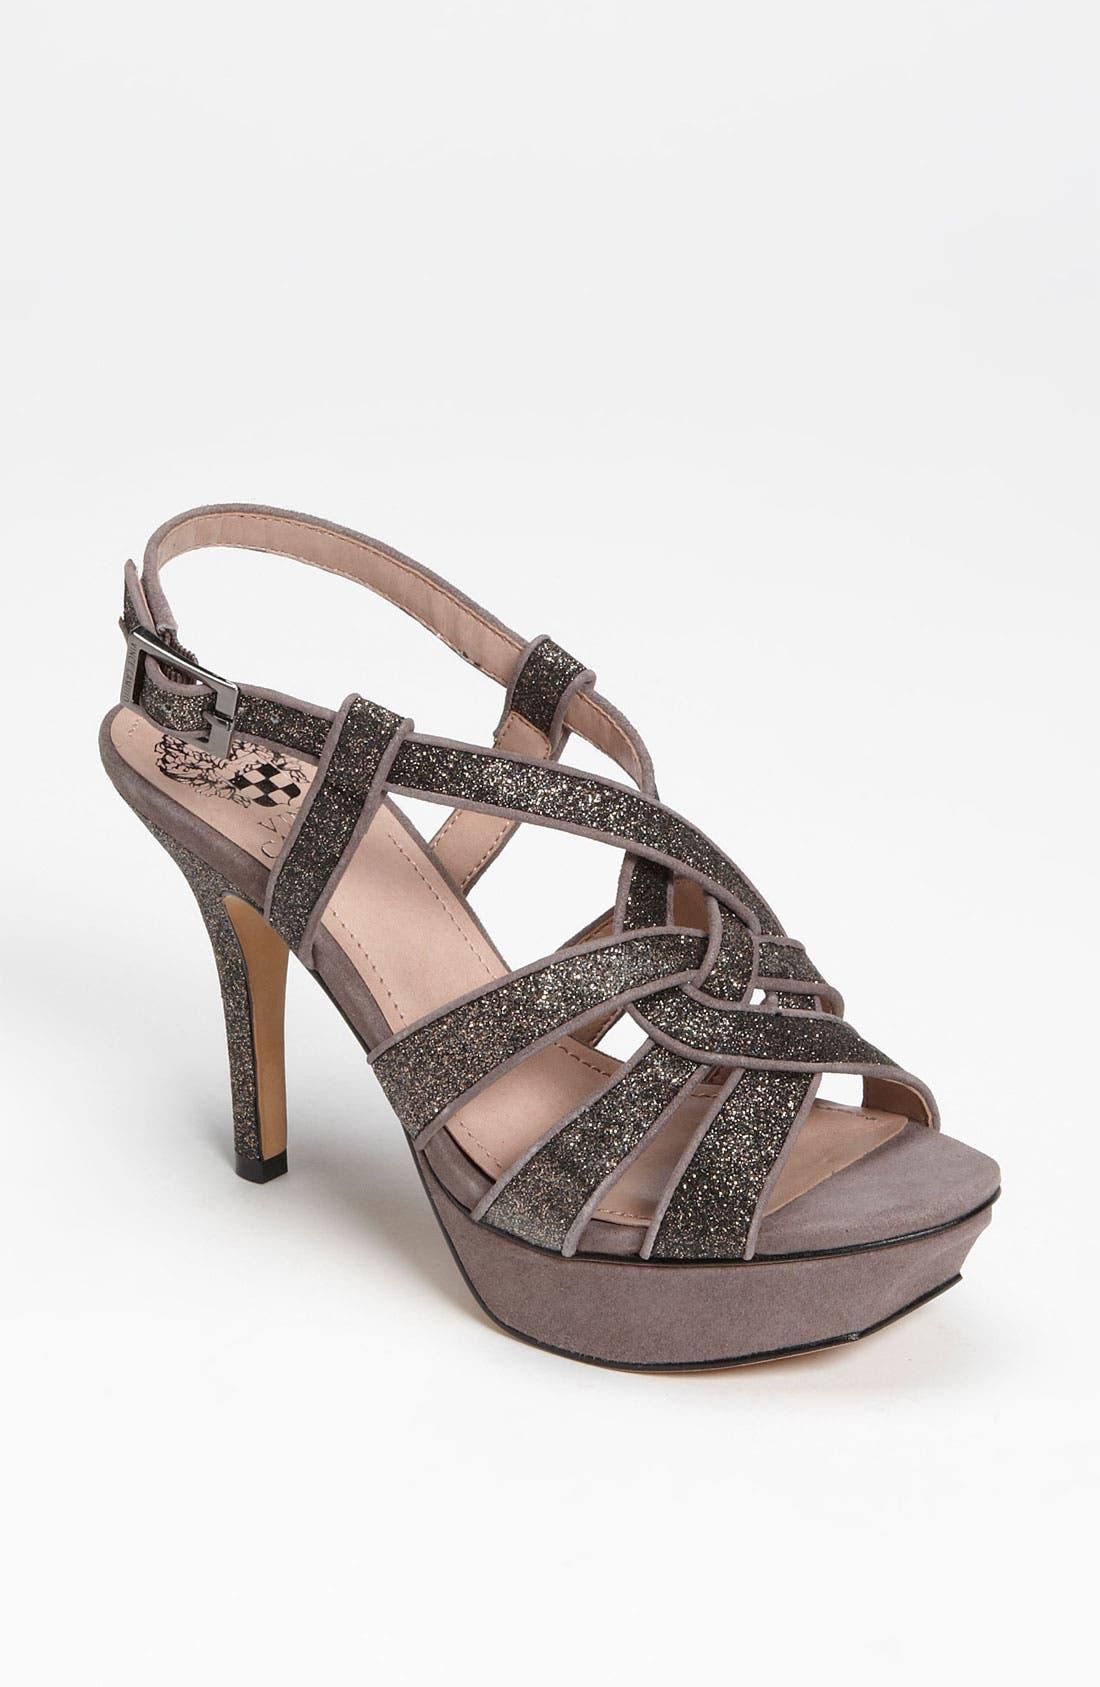 Main Image - Vince Camuto 'Tranton' Sandal